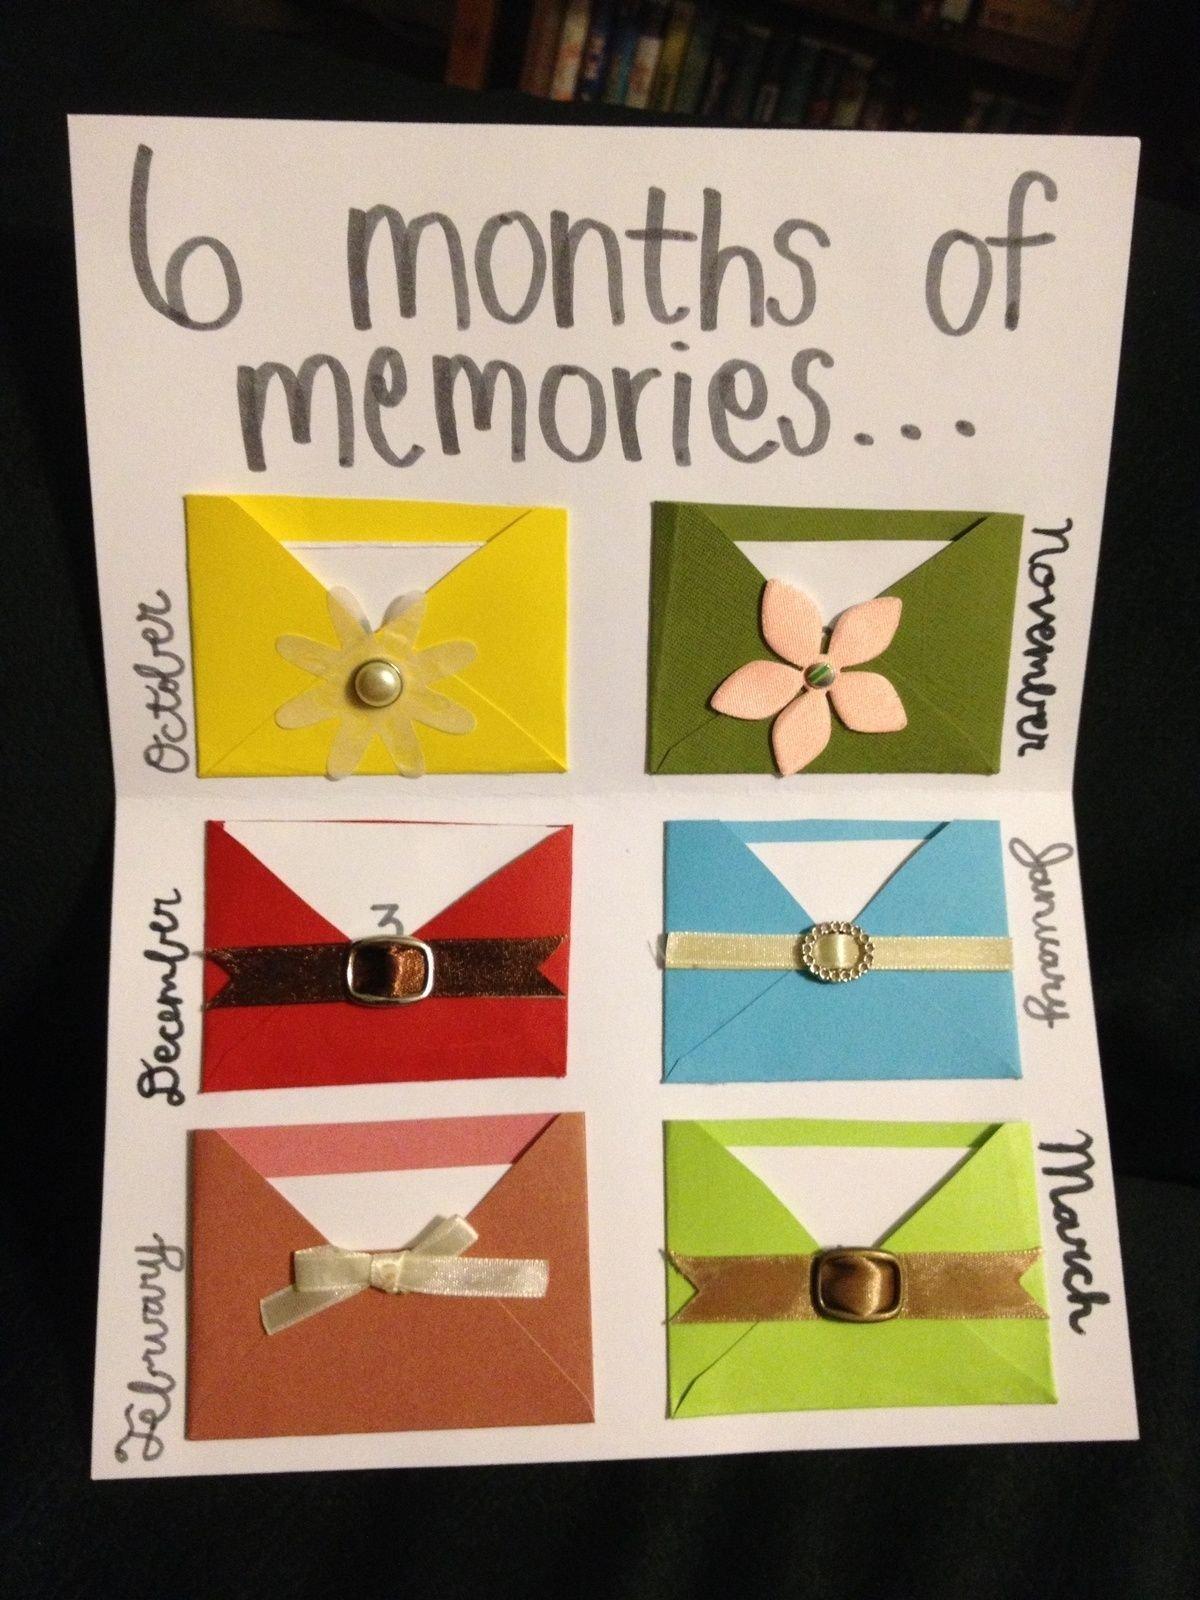 10 Most Recommended Cute 6 Month Anniversary Ideas e4d5368026f67b6ca6064cc2d8c9fcc8 1 200x1 600 pixeles pinteres 8 2021